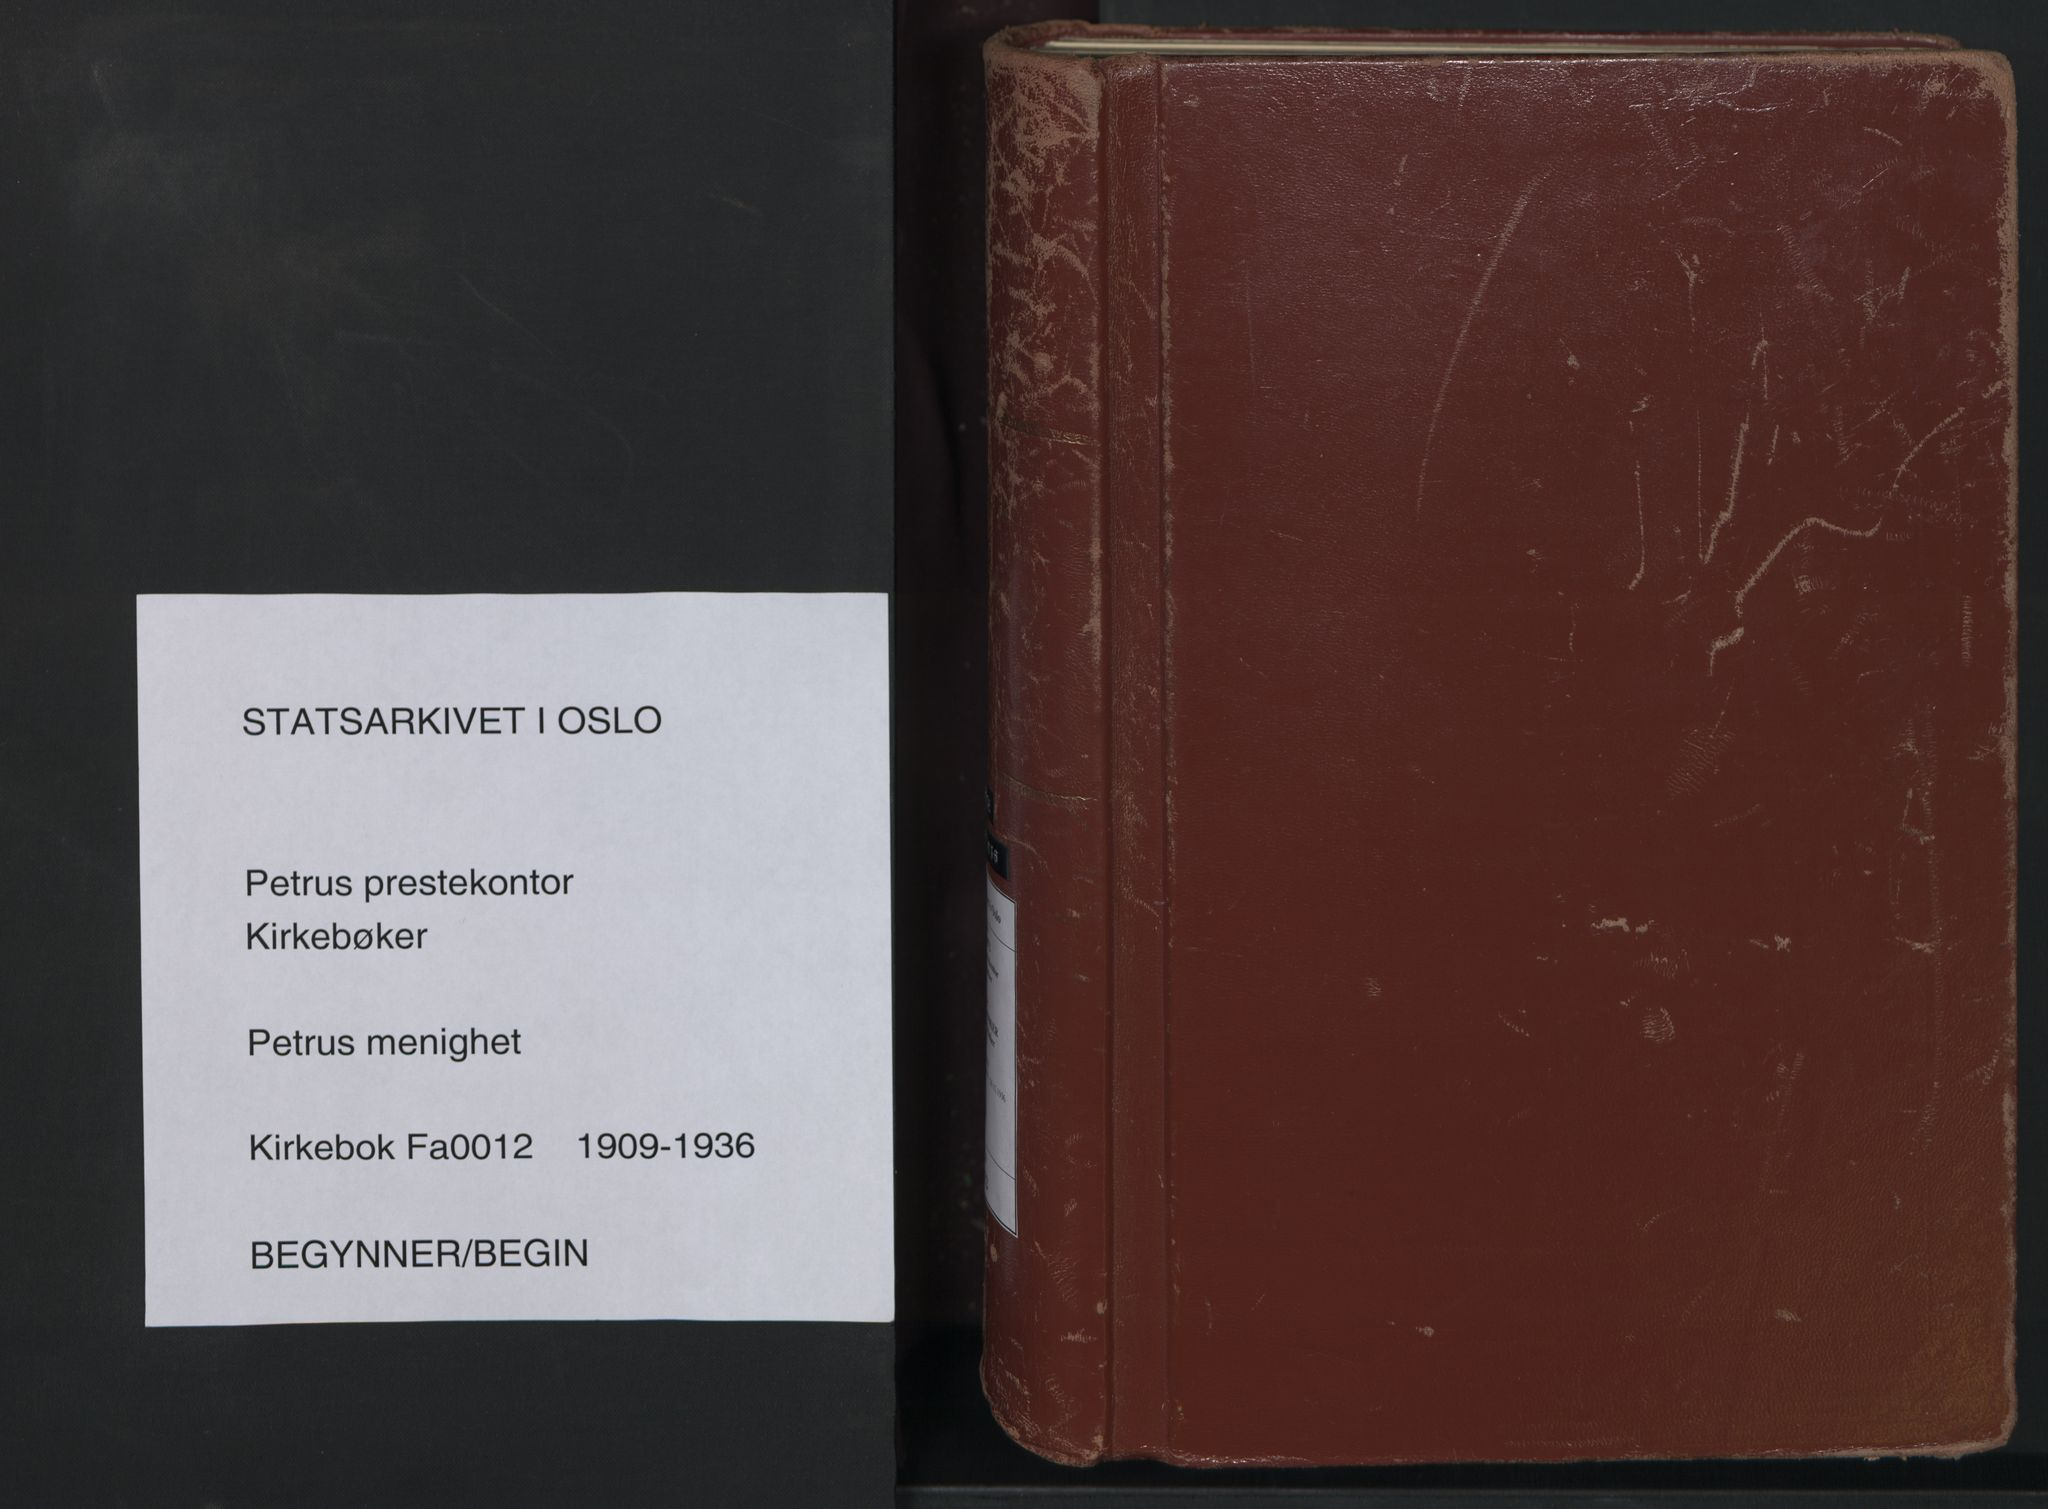 SAO, Petrus prestekontor Kirkebøker, F/Fa/L0012: Ministerialbok nr. 12, 1909-1936